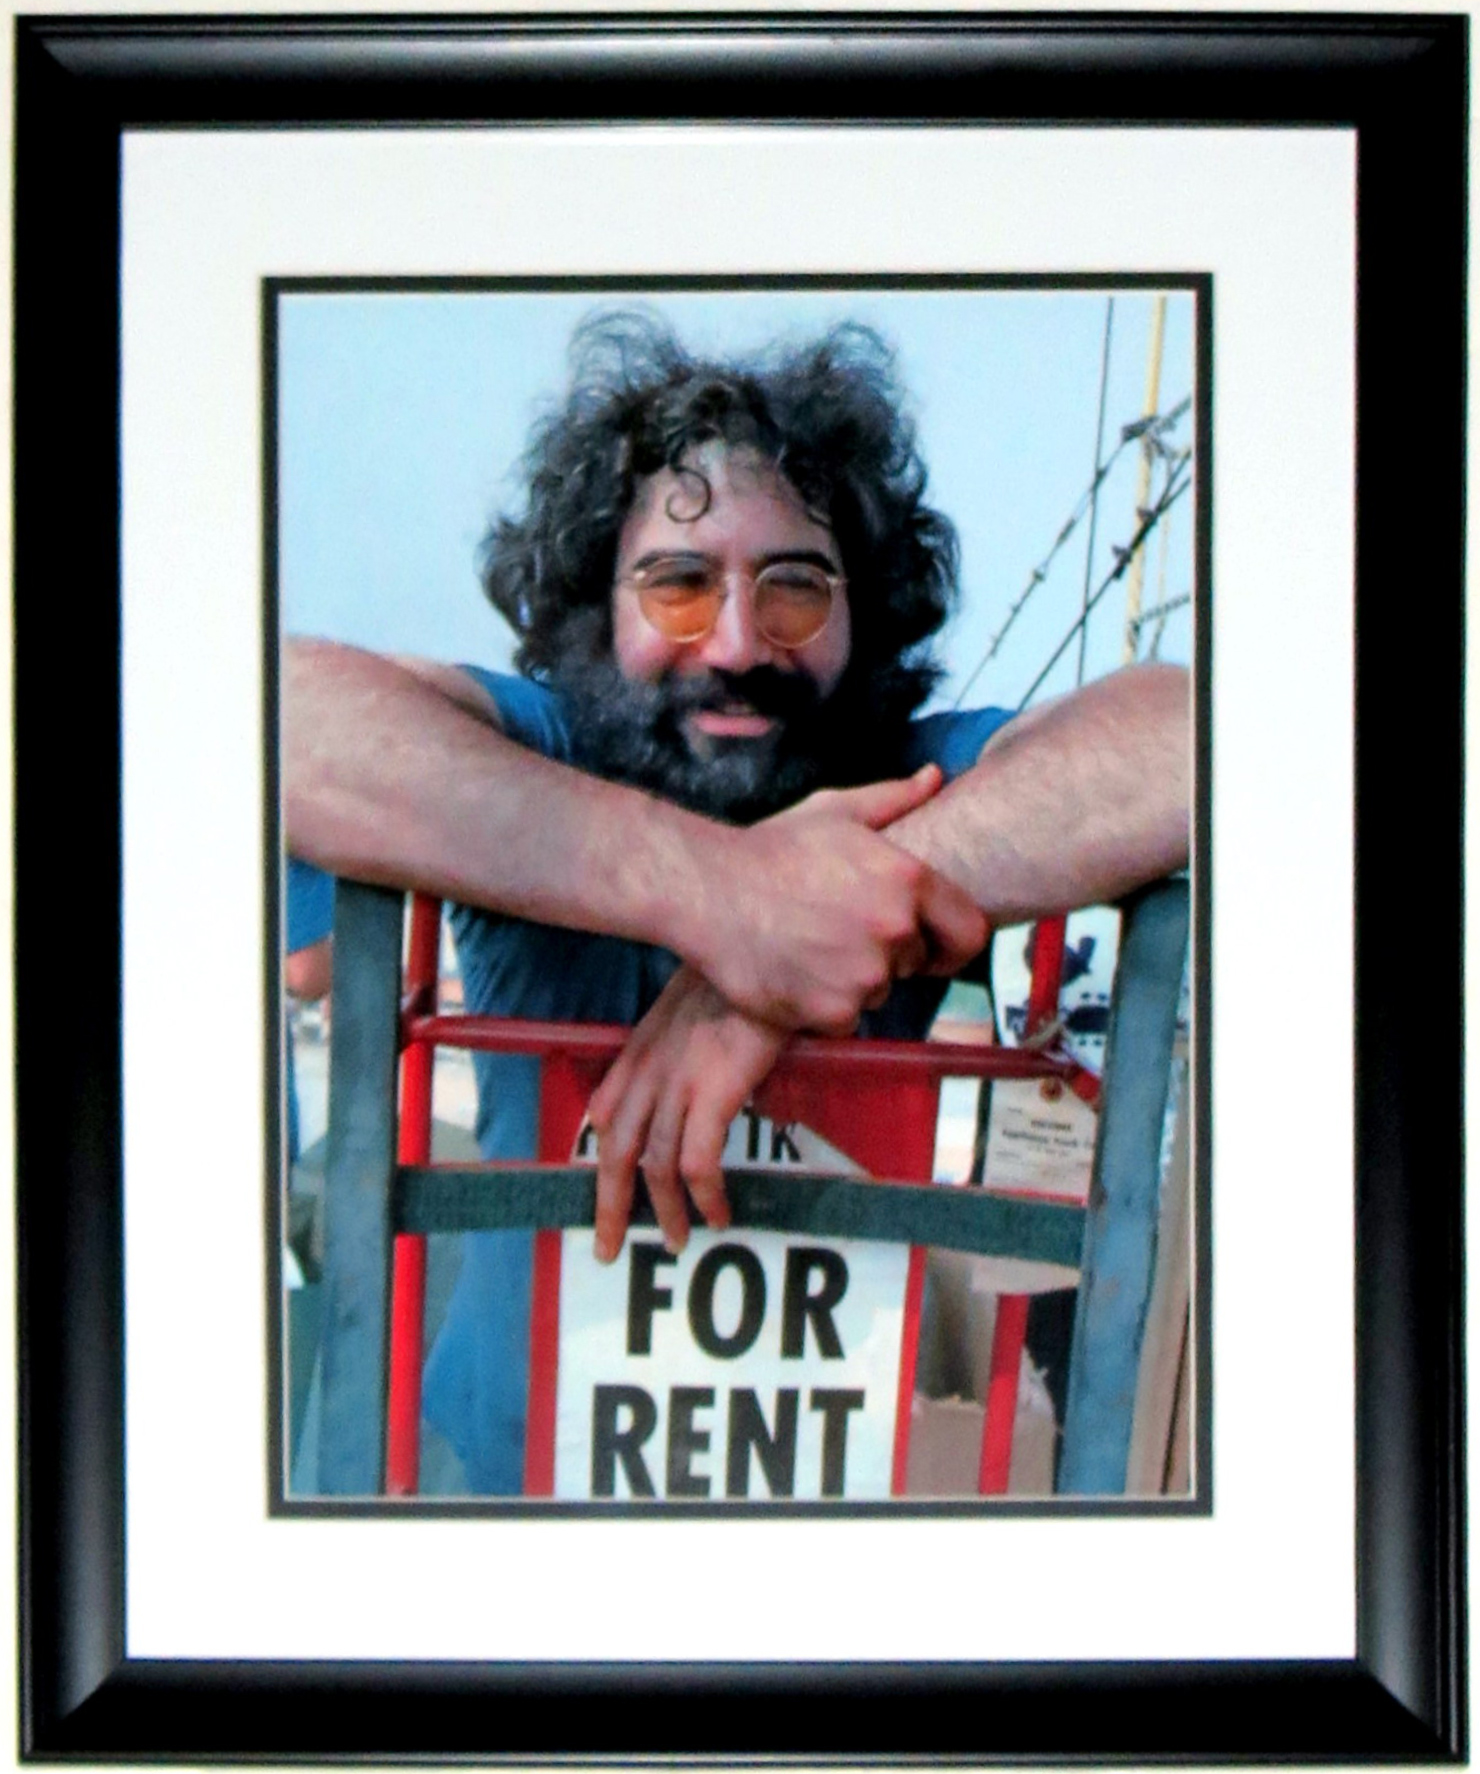 Jerry Garcia Grateful Dead Woodstock 1969 11x14 Photo - Professionally Framed